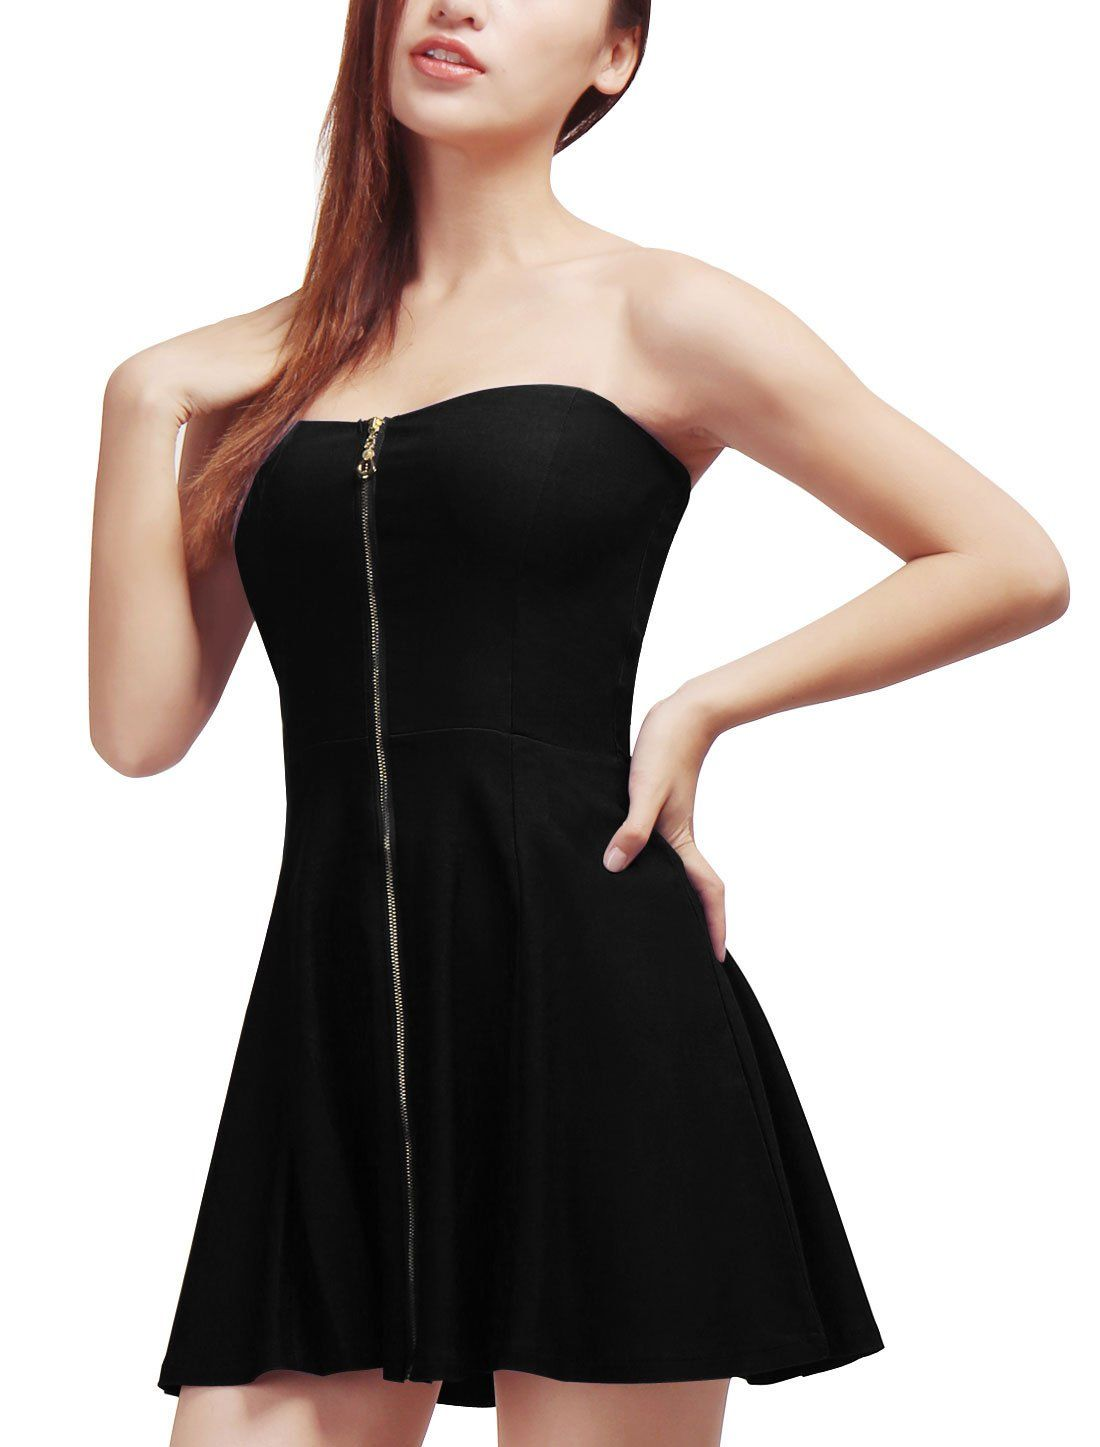 Black Zipper Front Strapless Mini Dress